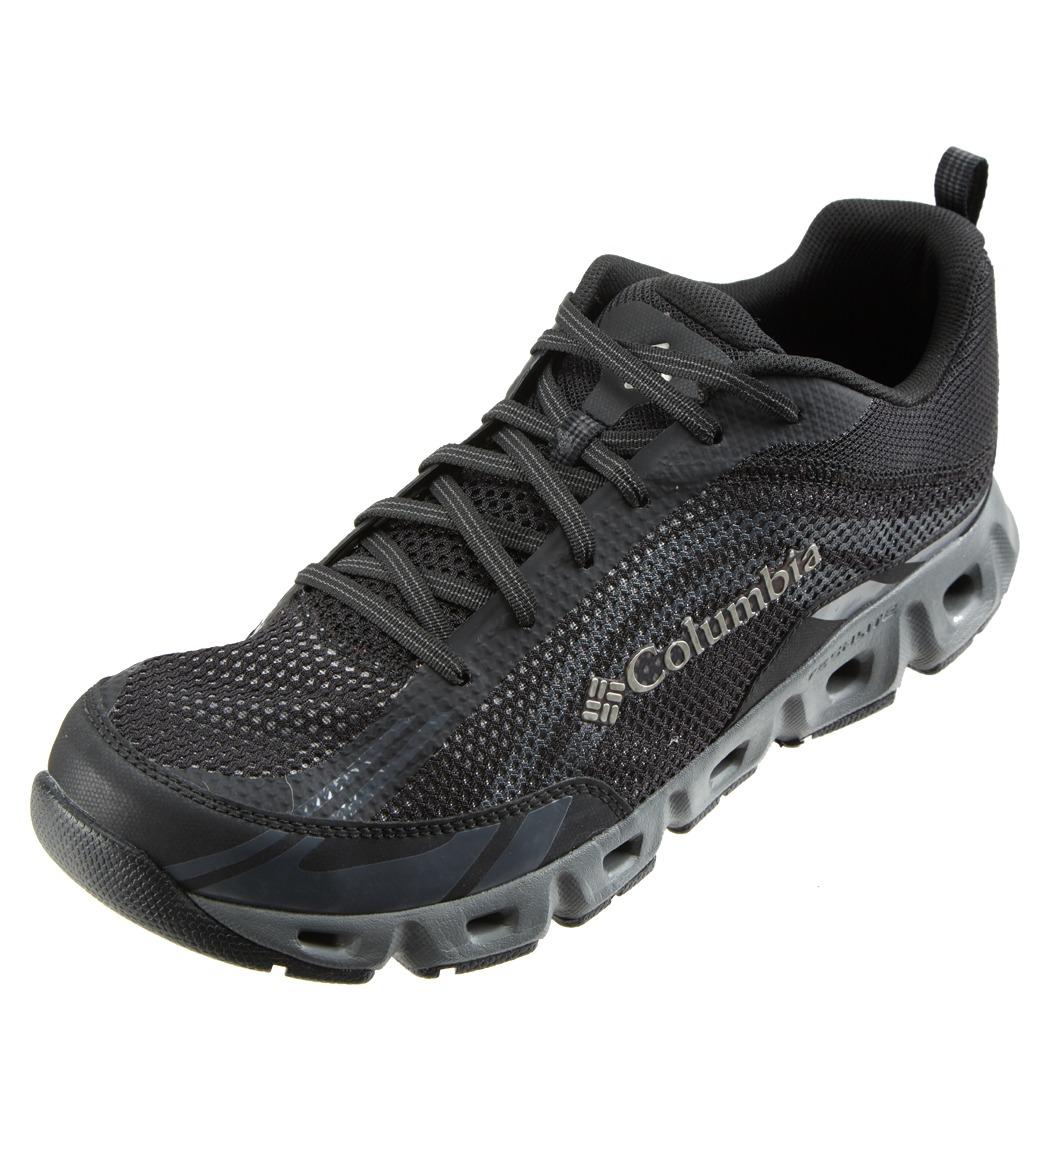 Drainmaker IV Hybrid Shoe